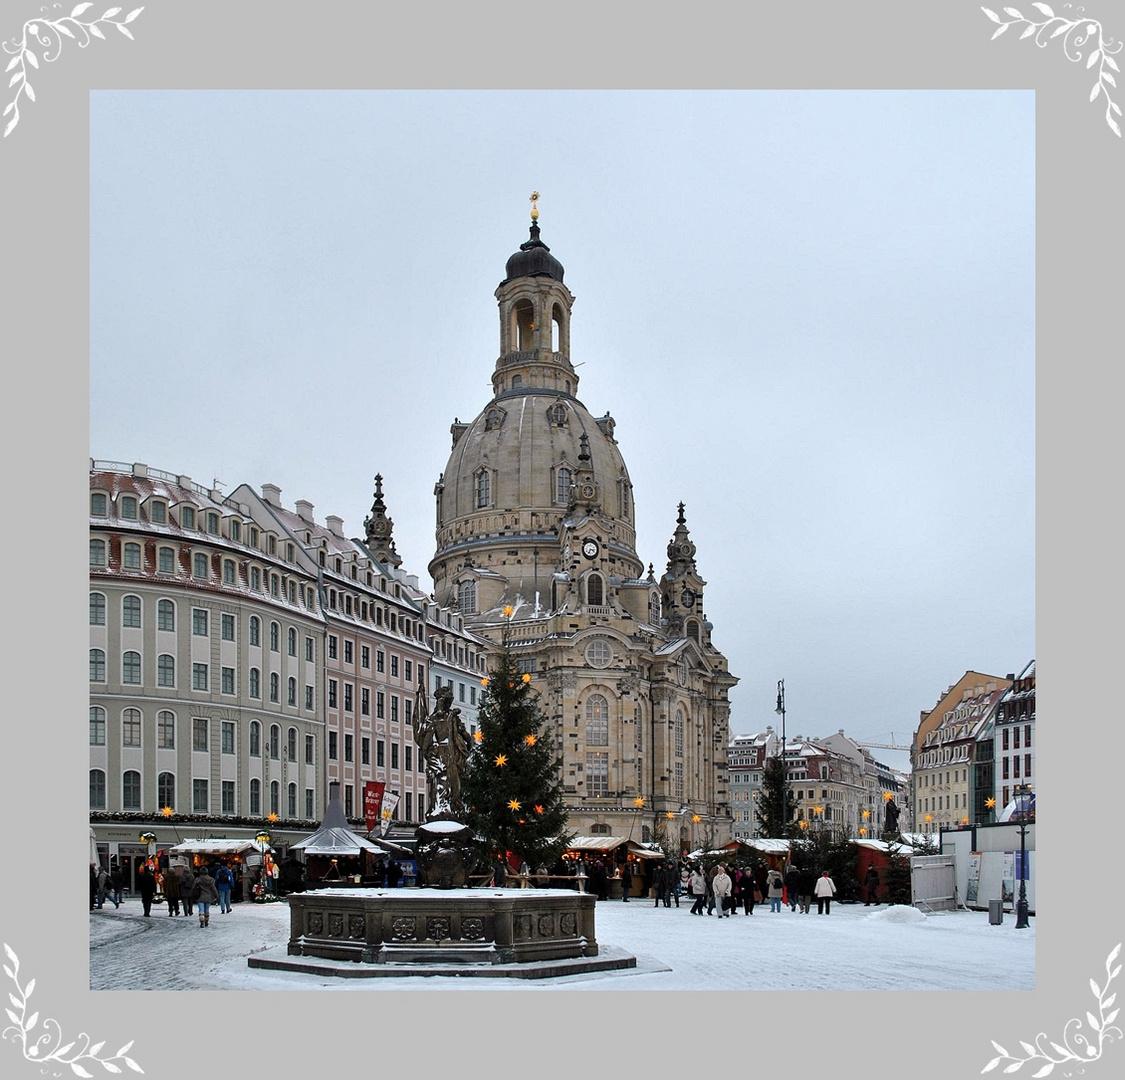 Frauenkirche im Advent